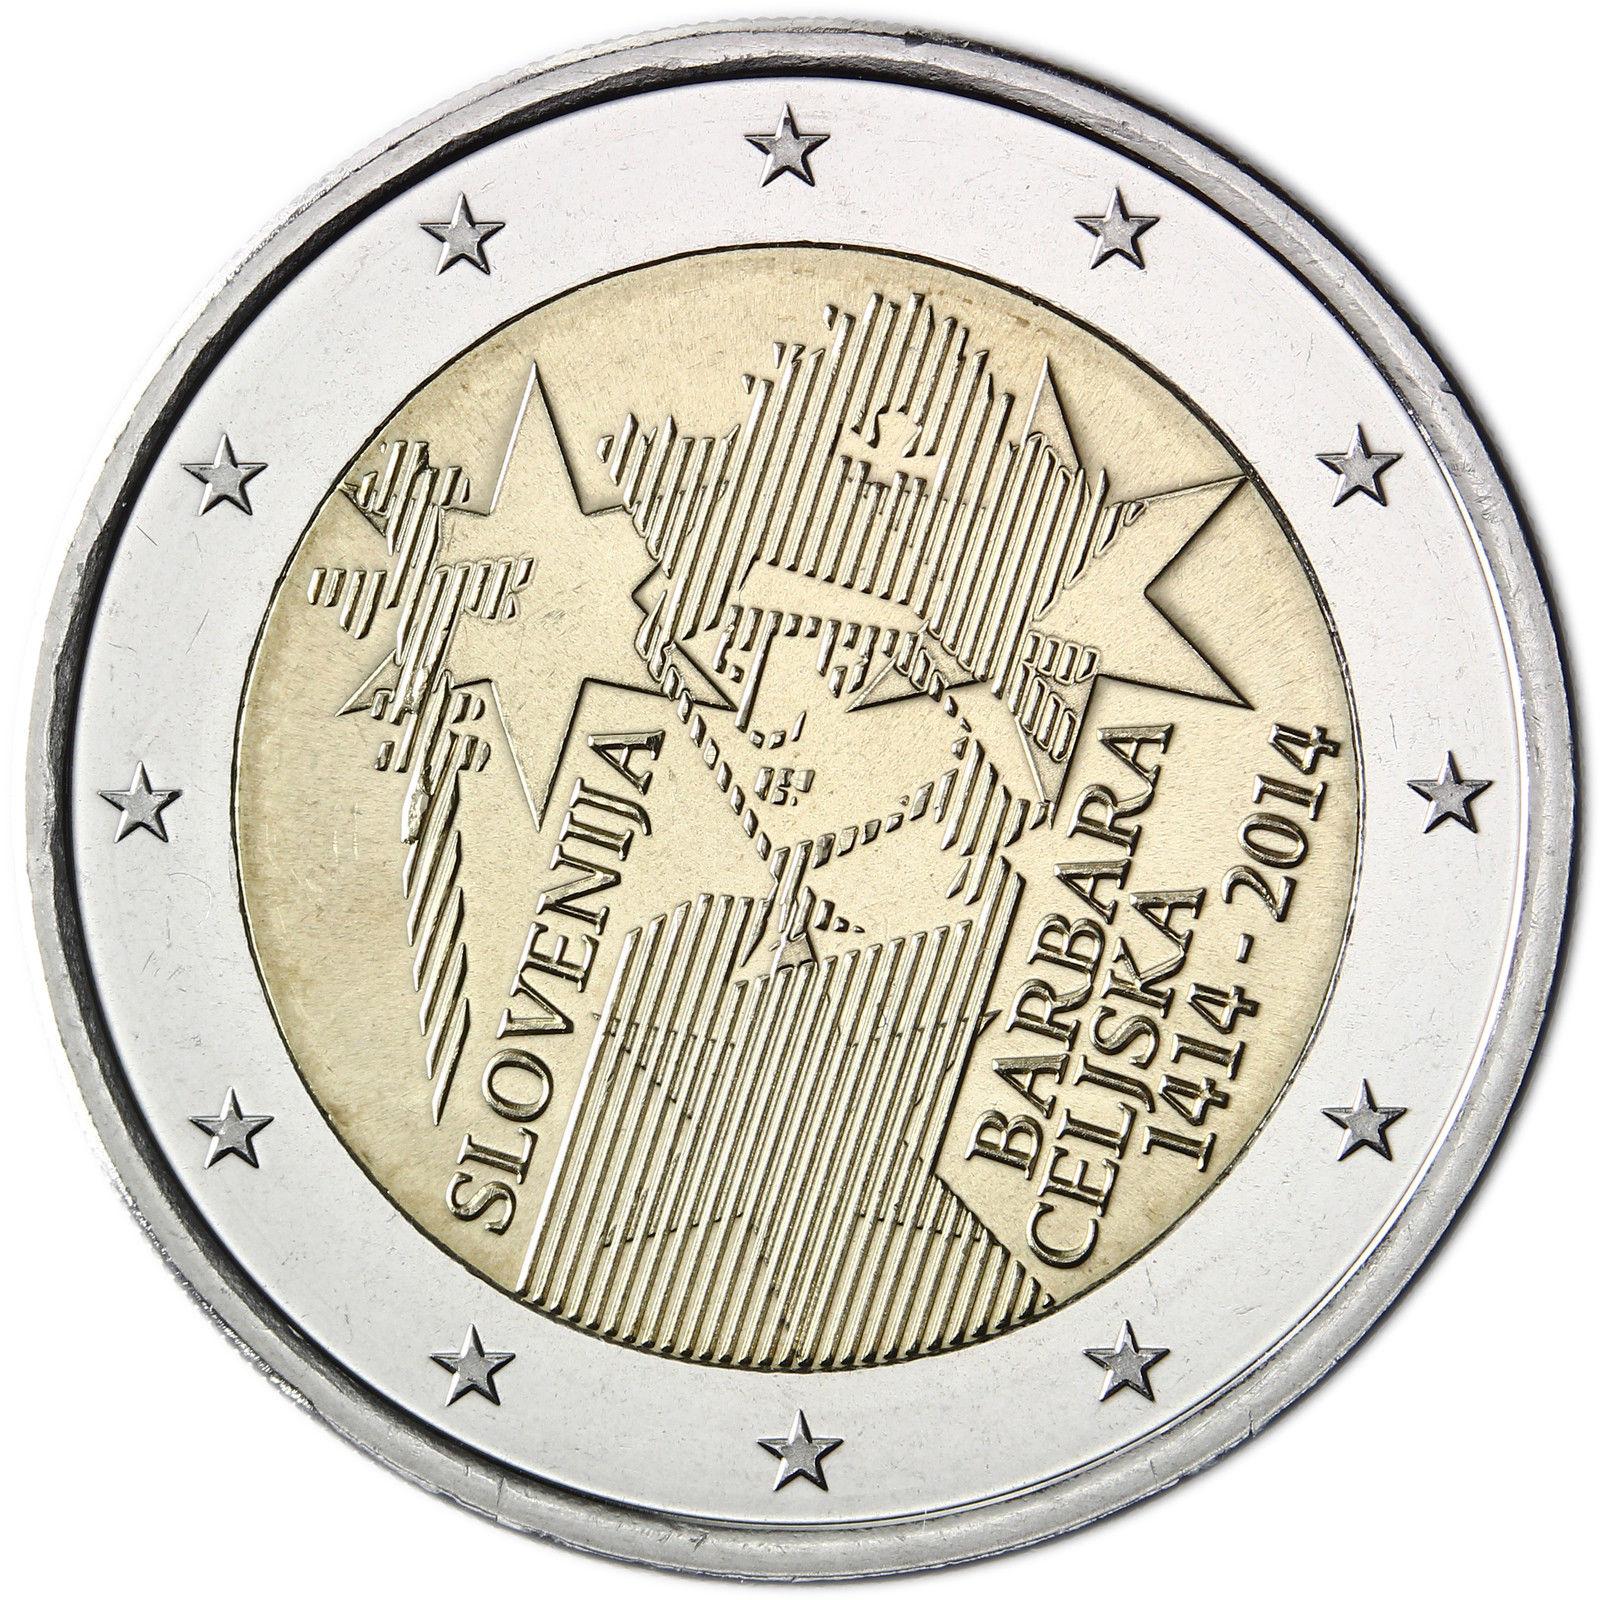 39f6afba14 Obverse of Slovenia 2 euros 2014 - 600th anniversary of Barbara of Celje